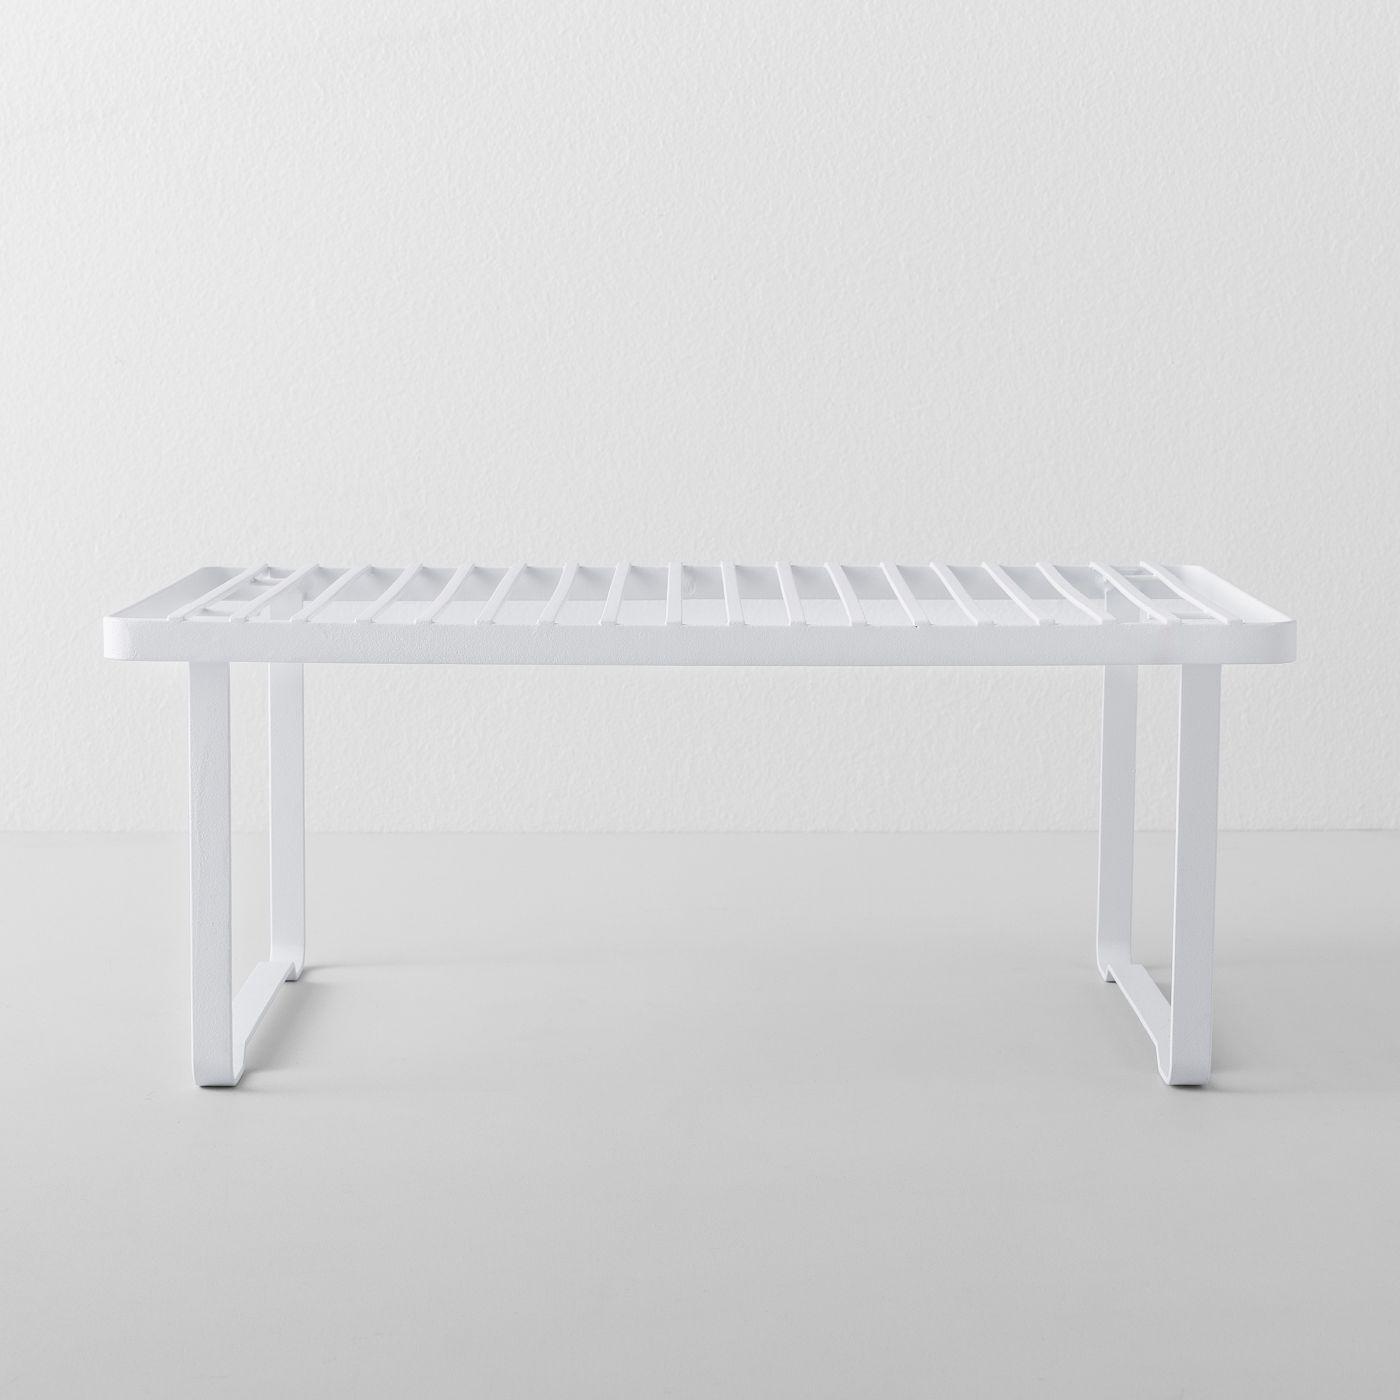 White stand-alone shelf